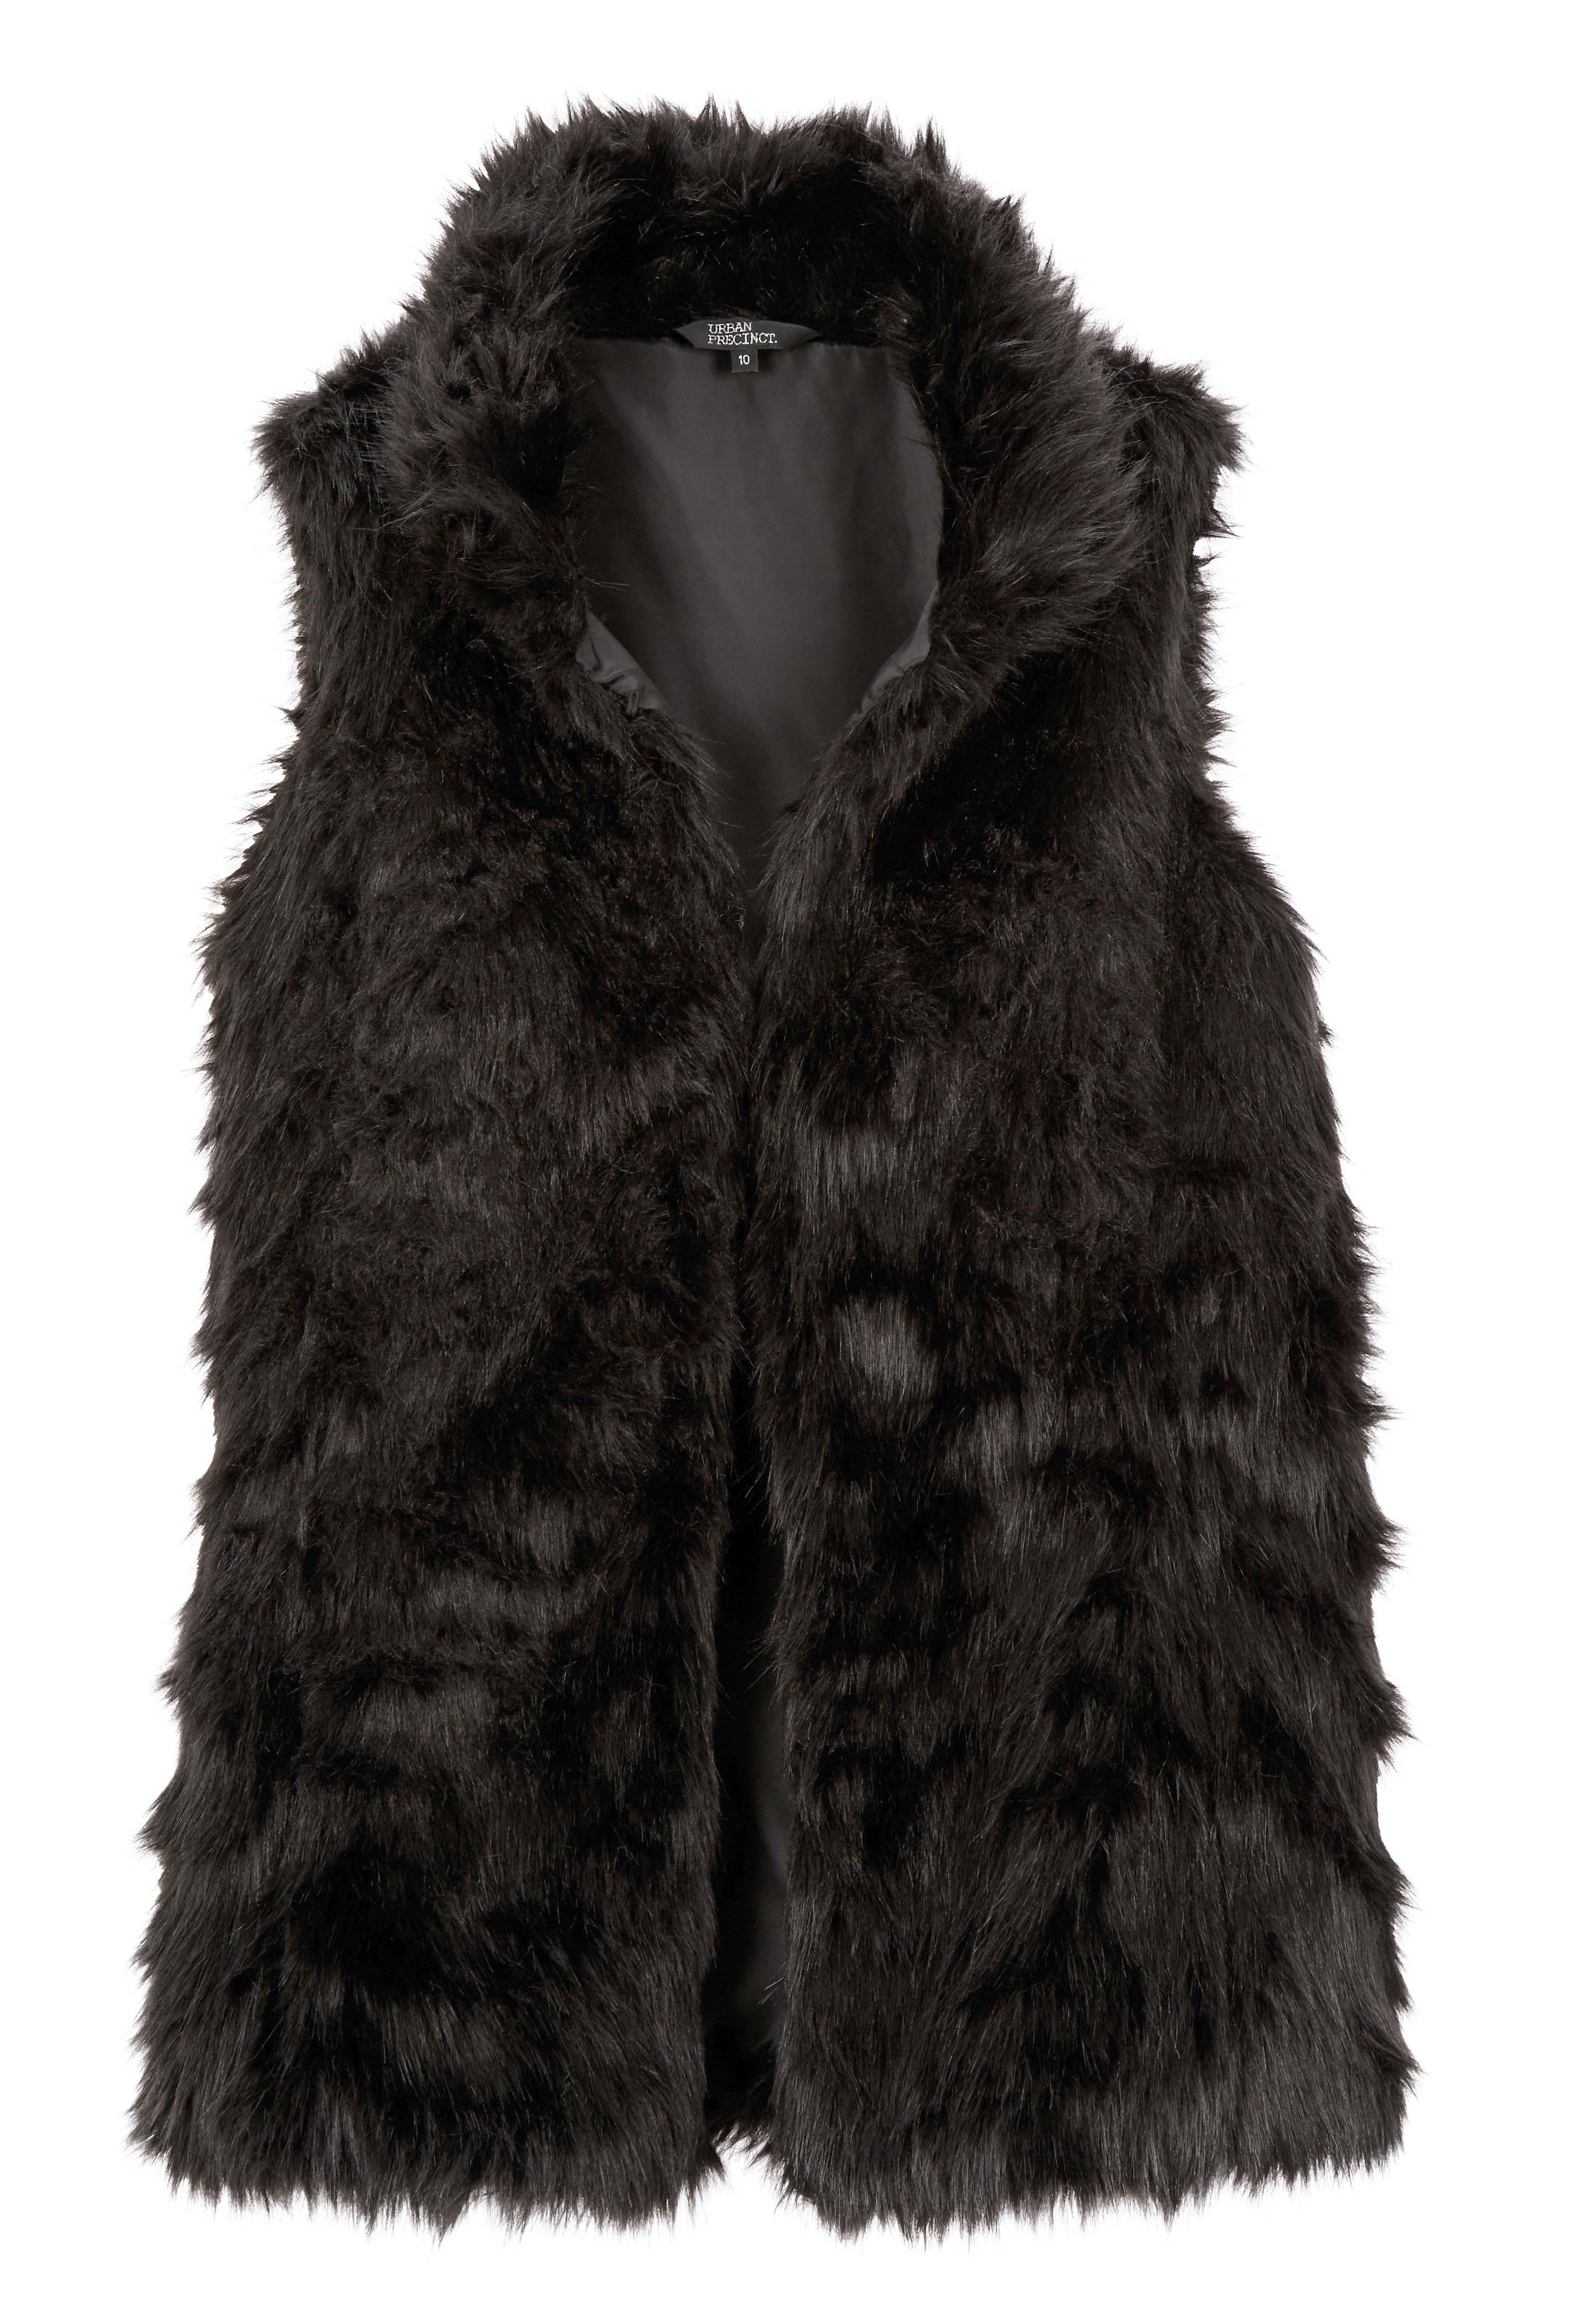 6064578 Urban Precinct Fur Vest $109.99 Instore Mar 08 2016